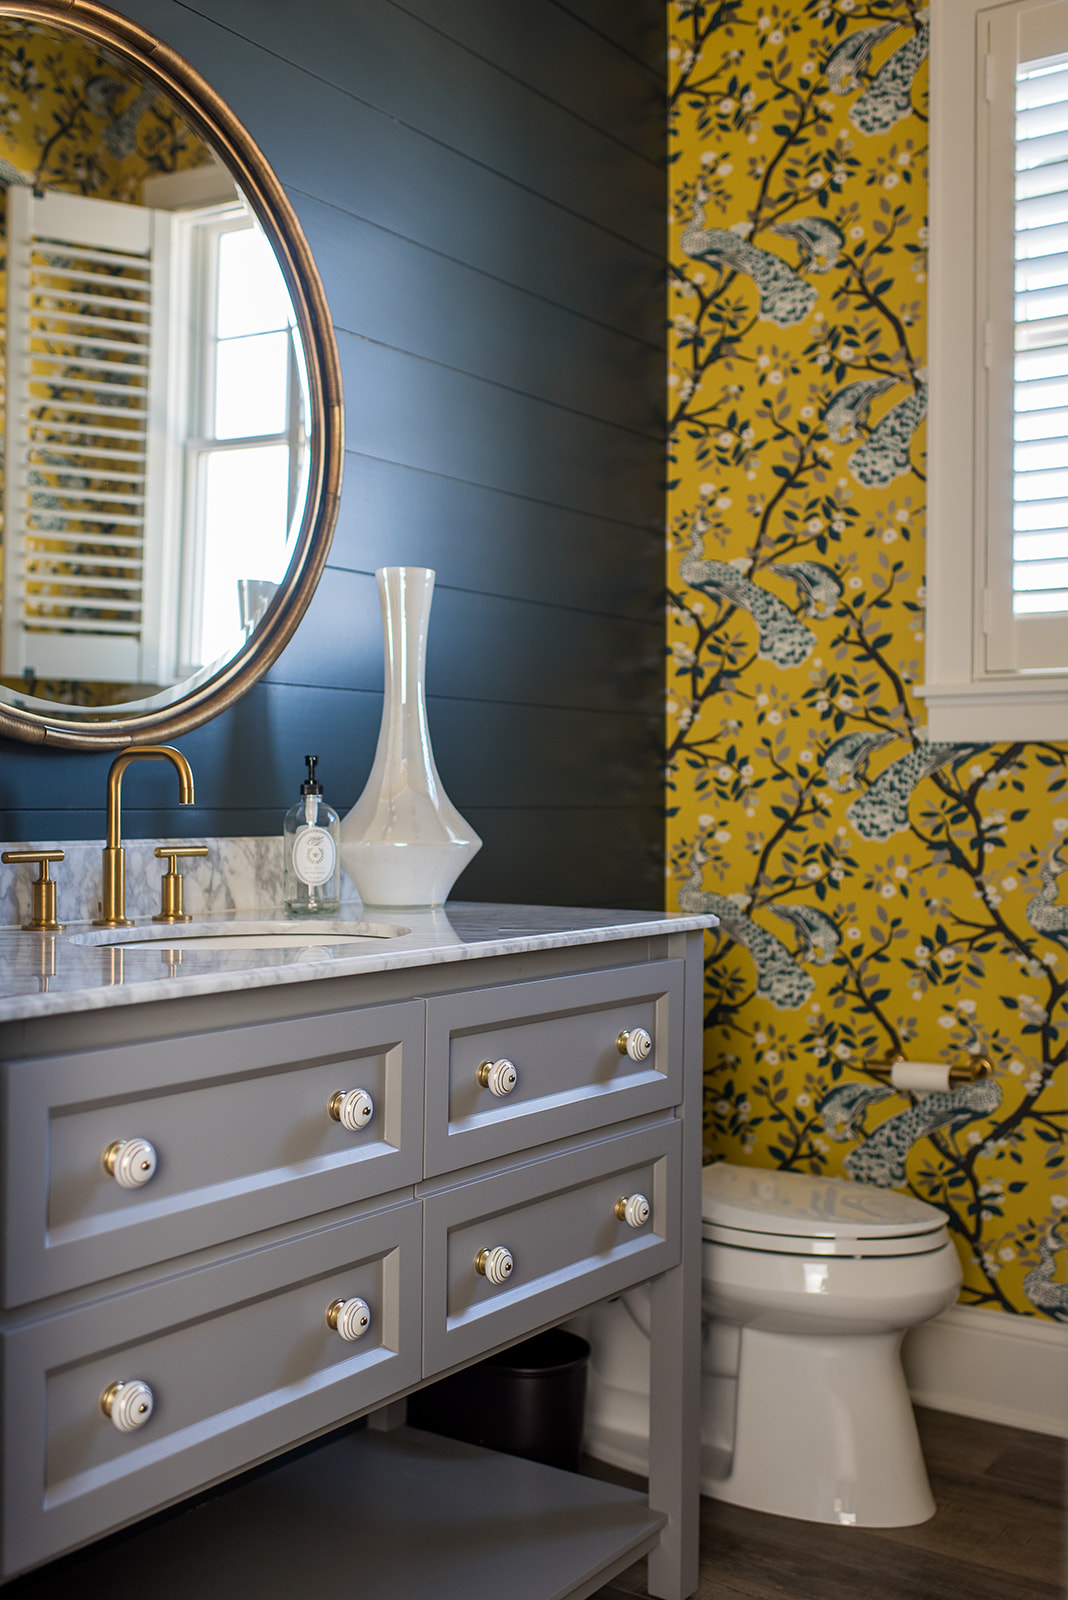 Wallpaper Woes: Tips for Avoiding Wallpaper Mistakes